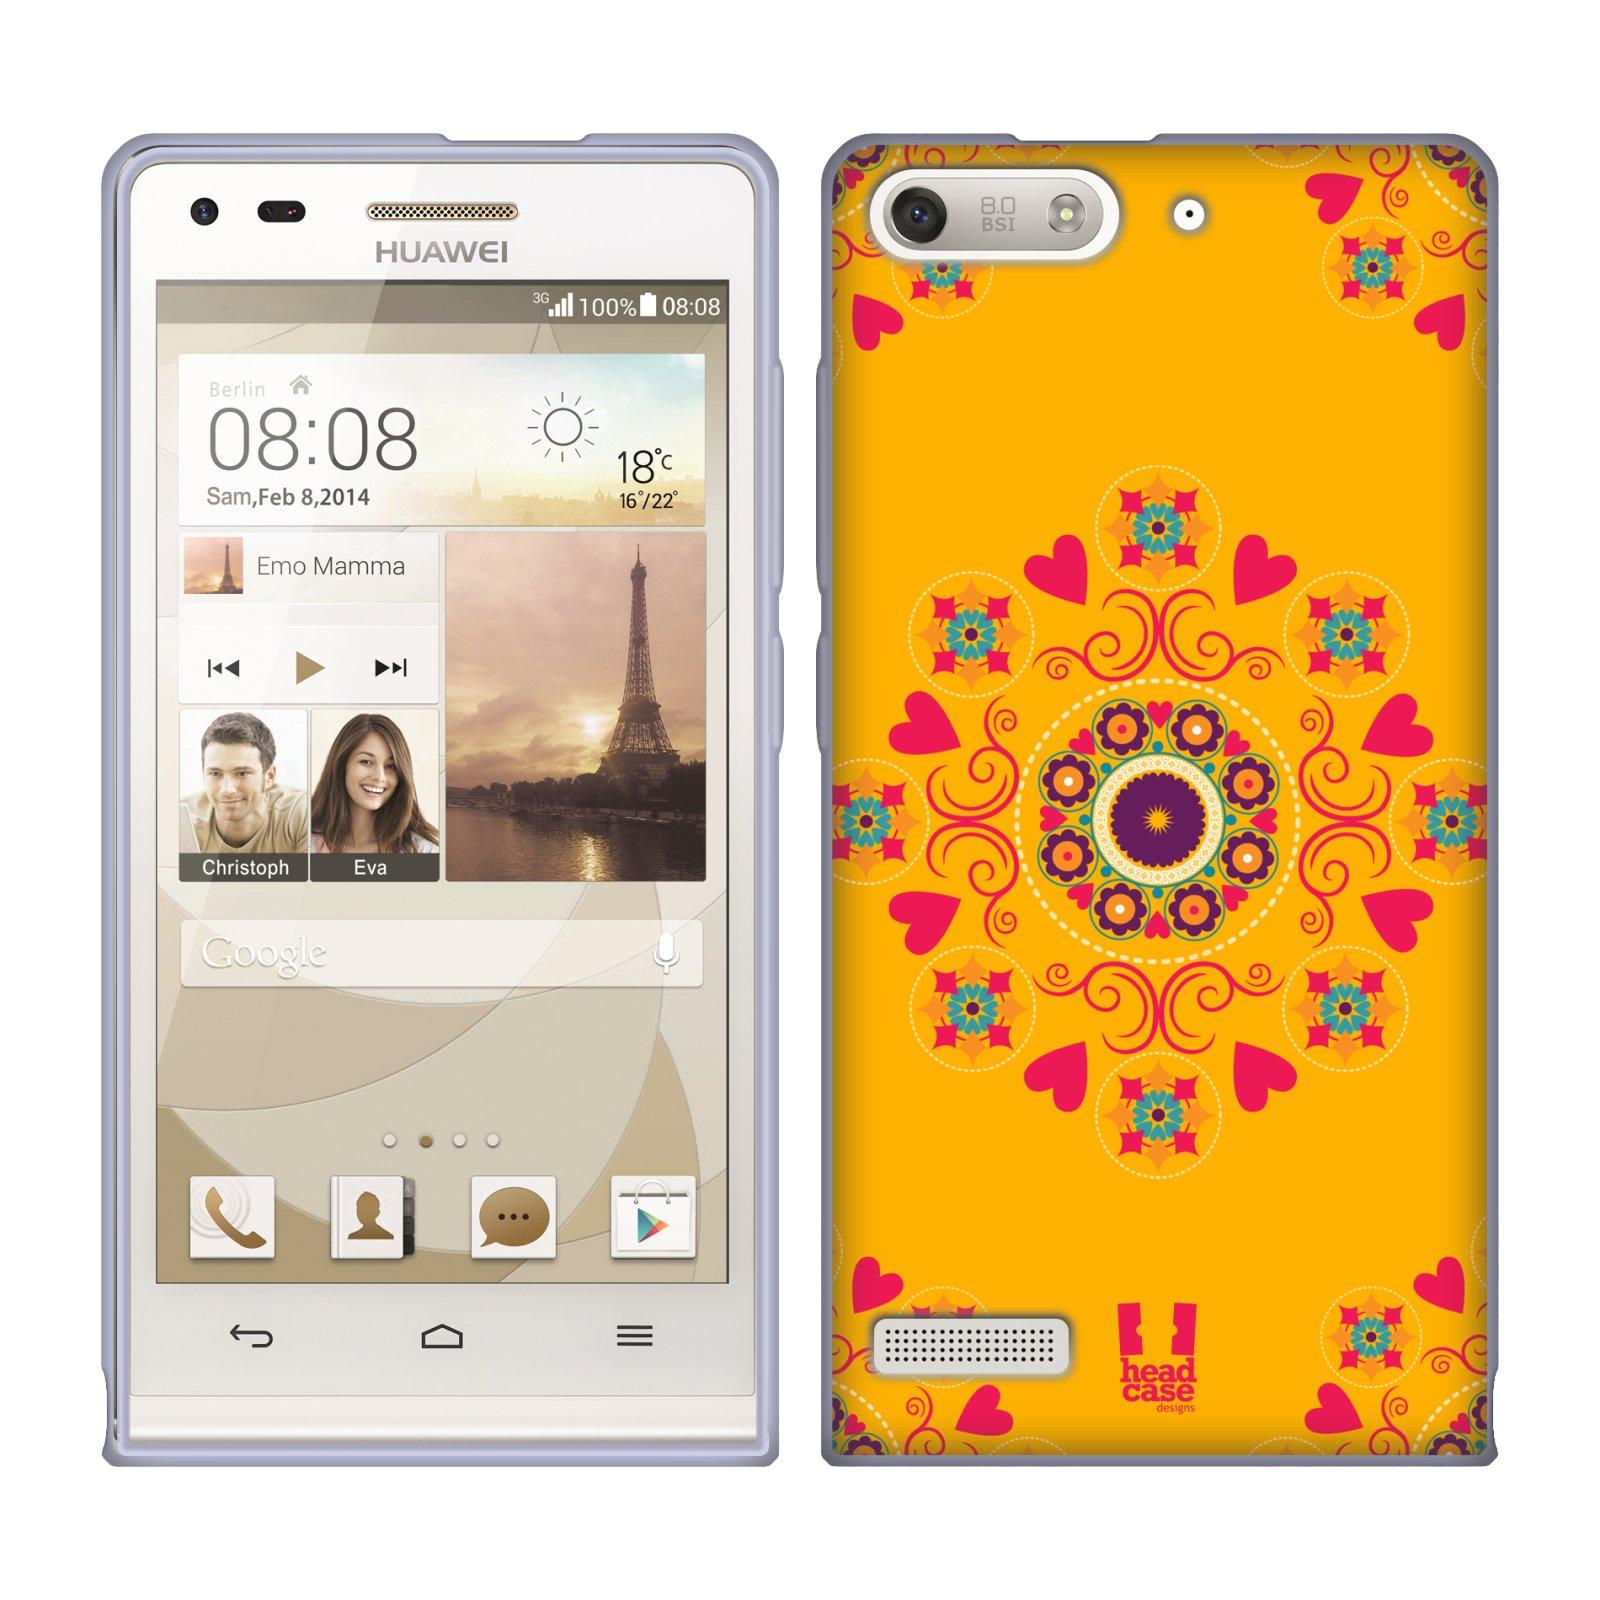 HEAD CASE silikonový obal na mobil Huawei Ascend G6 srdíčka kaleidoskop žlutá